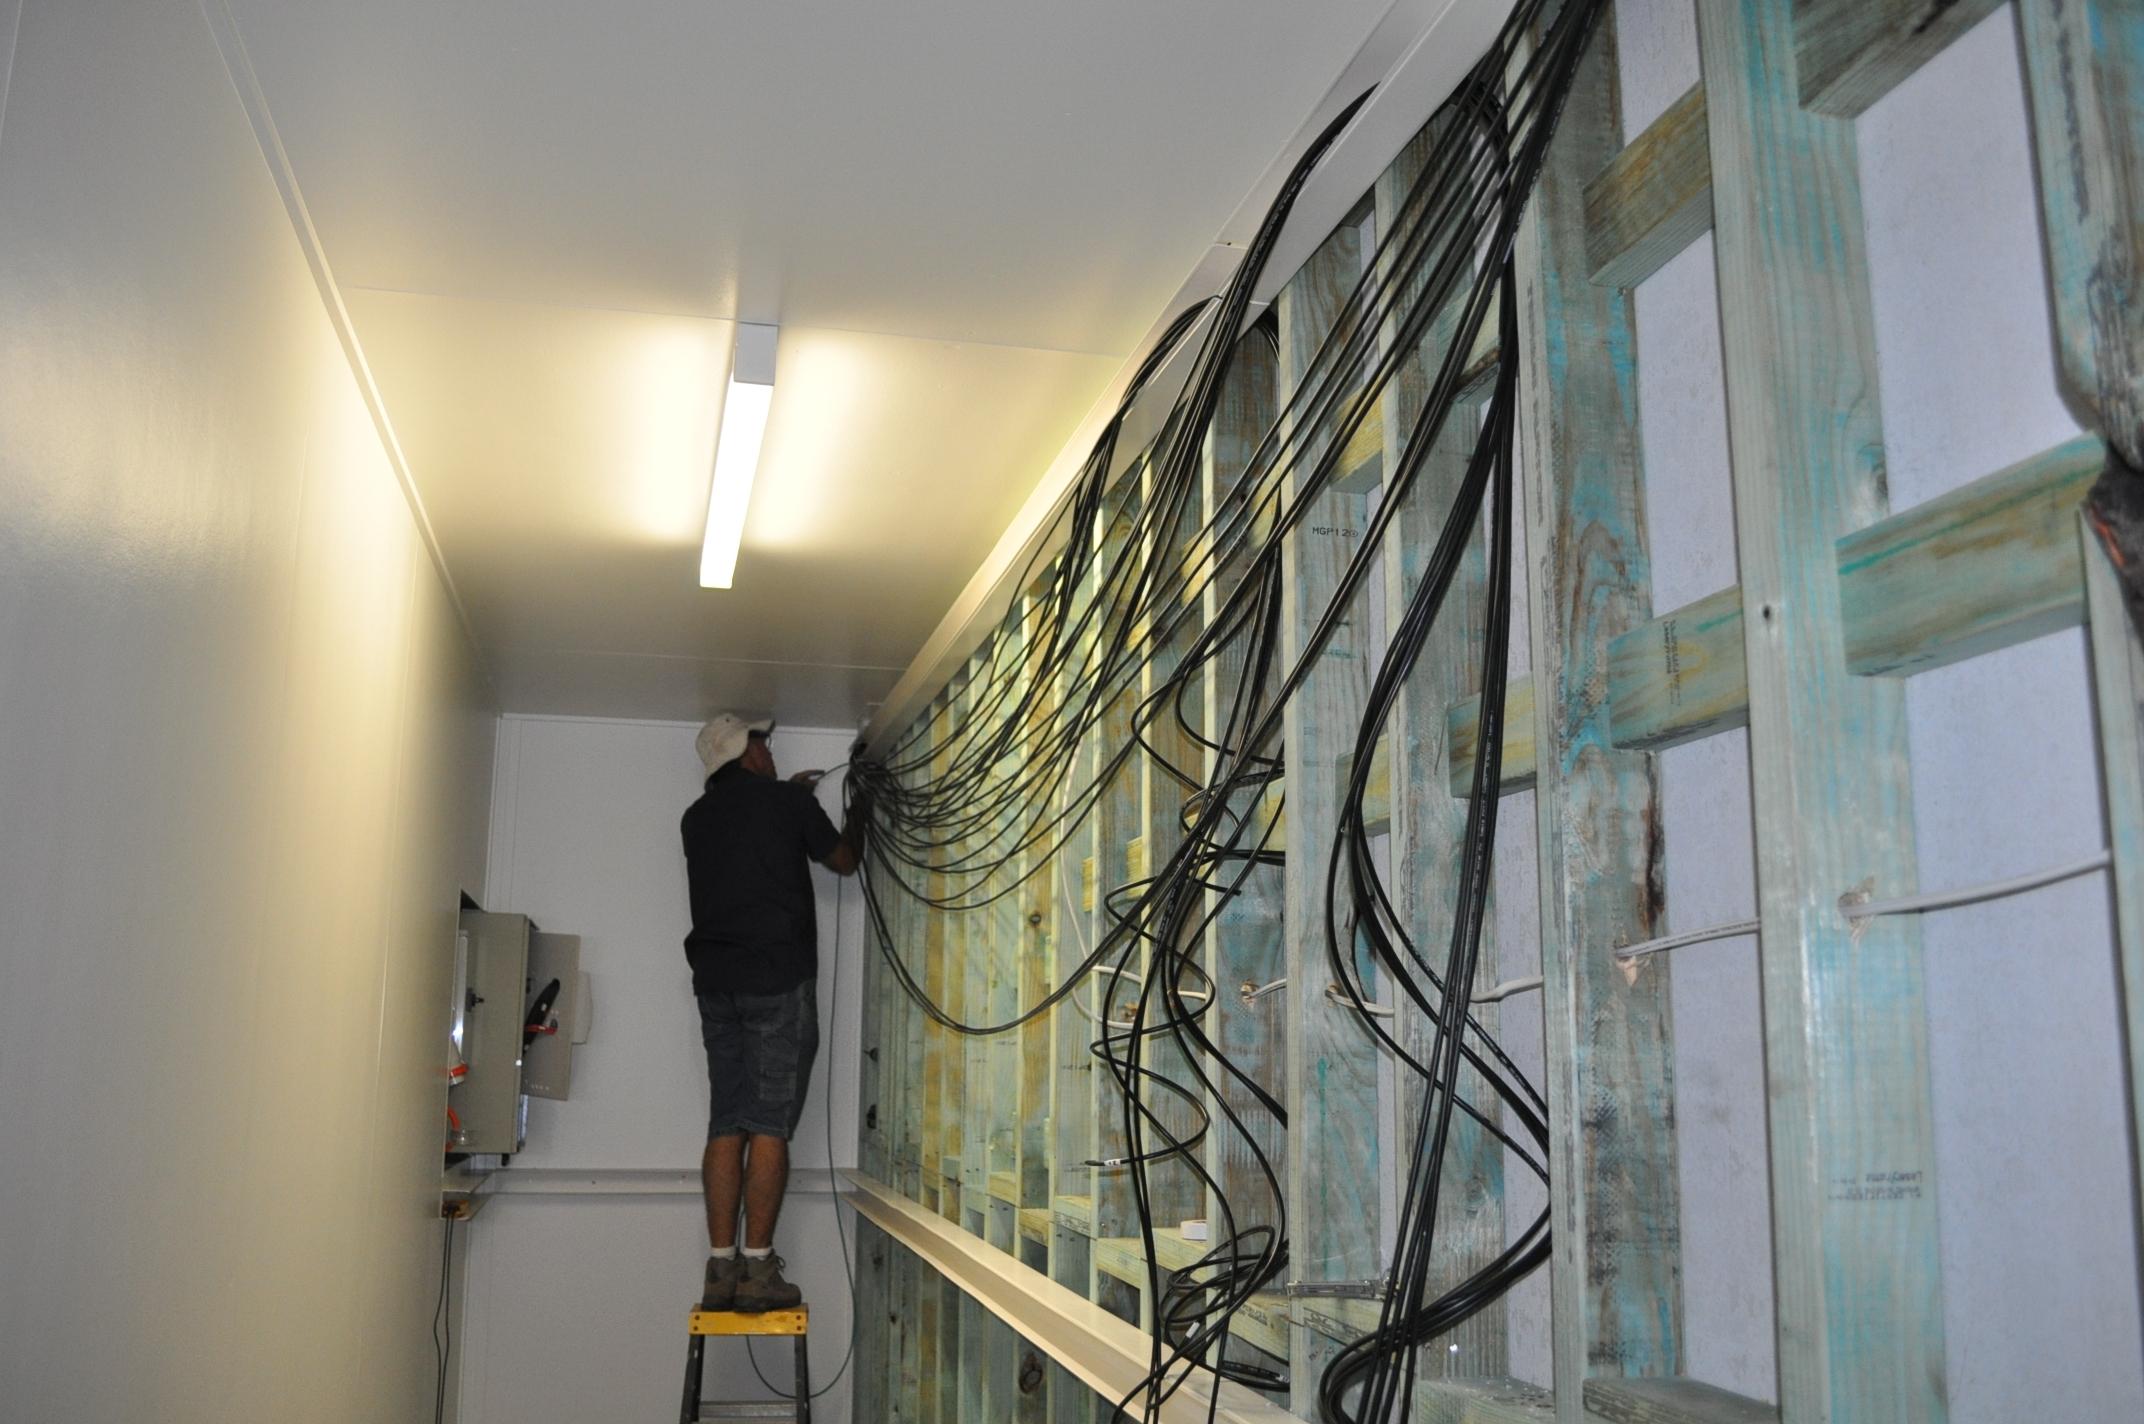 Pre-wiring